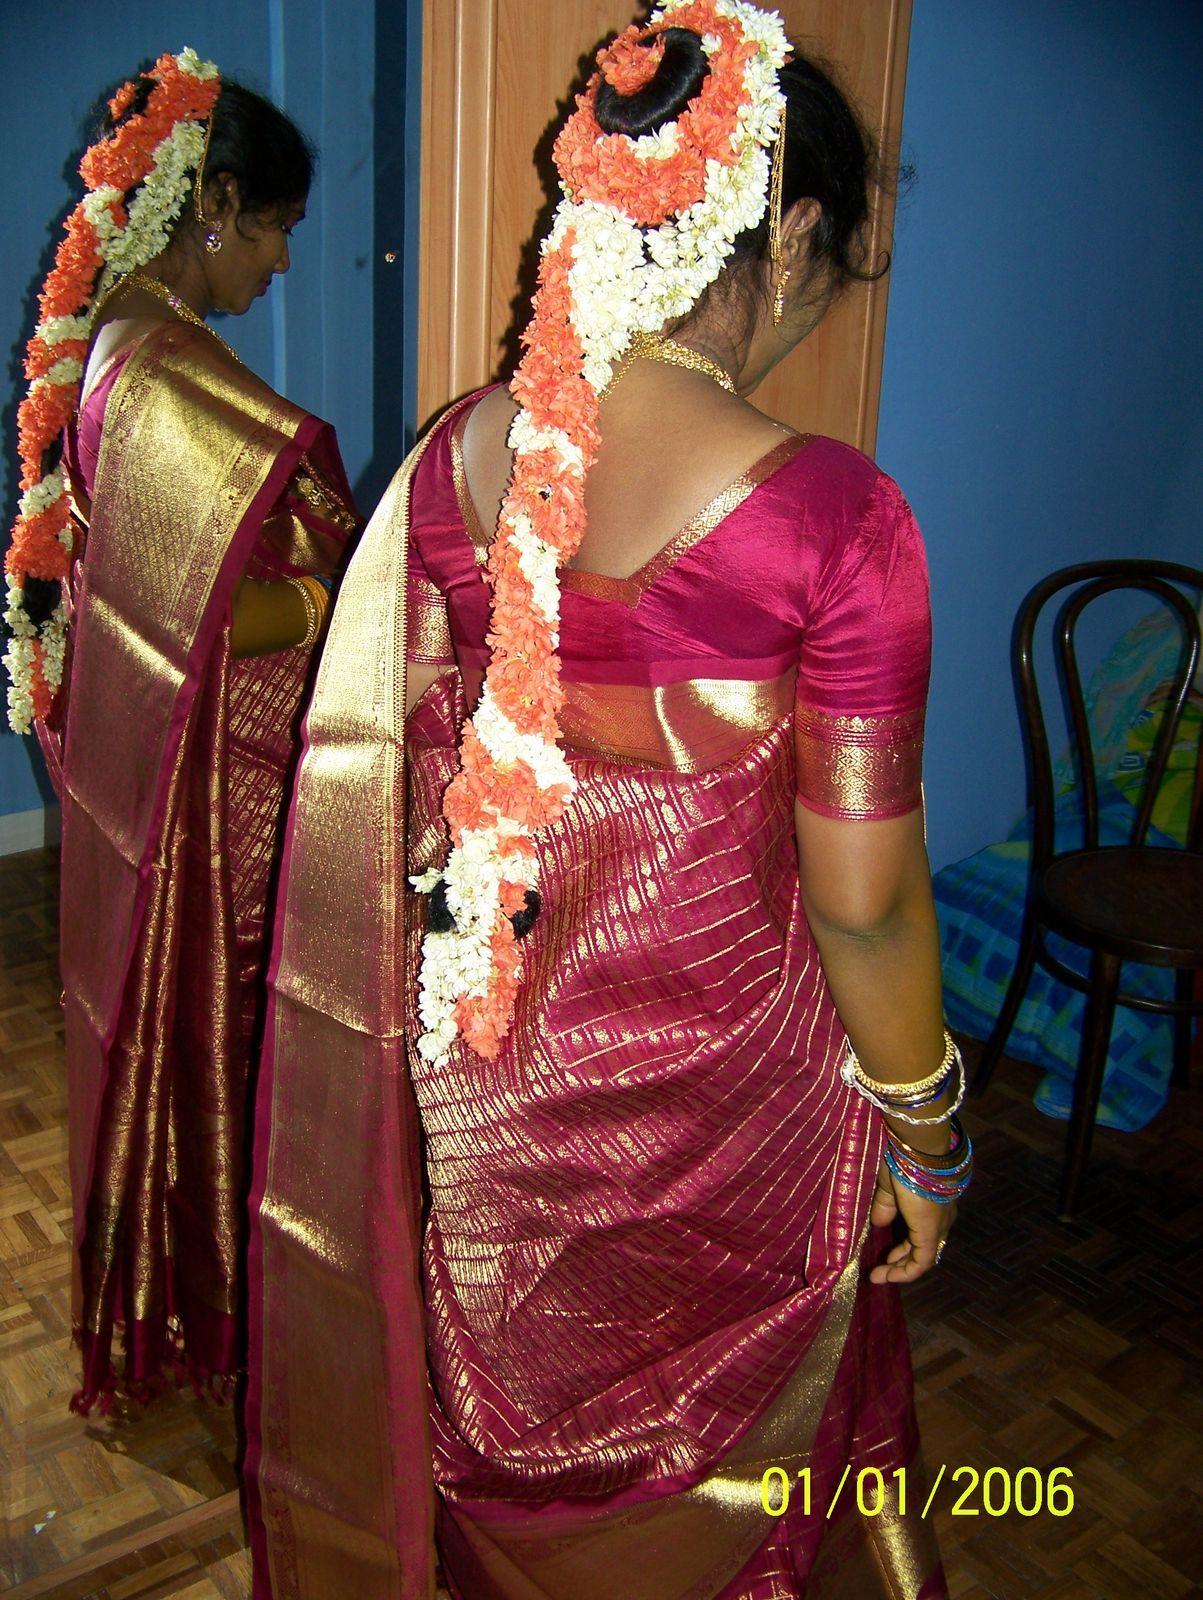 Valaikappu Makeup Hairstyle : valaikappu, makeup, hairstyle, Seemantham, South, Indian, Bride,, Designer, Dresses, Indian,, Bride, Hairstyle